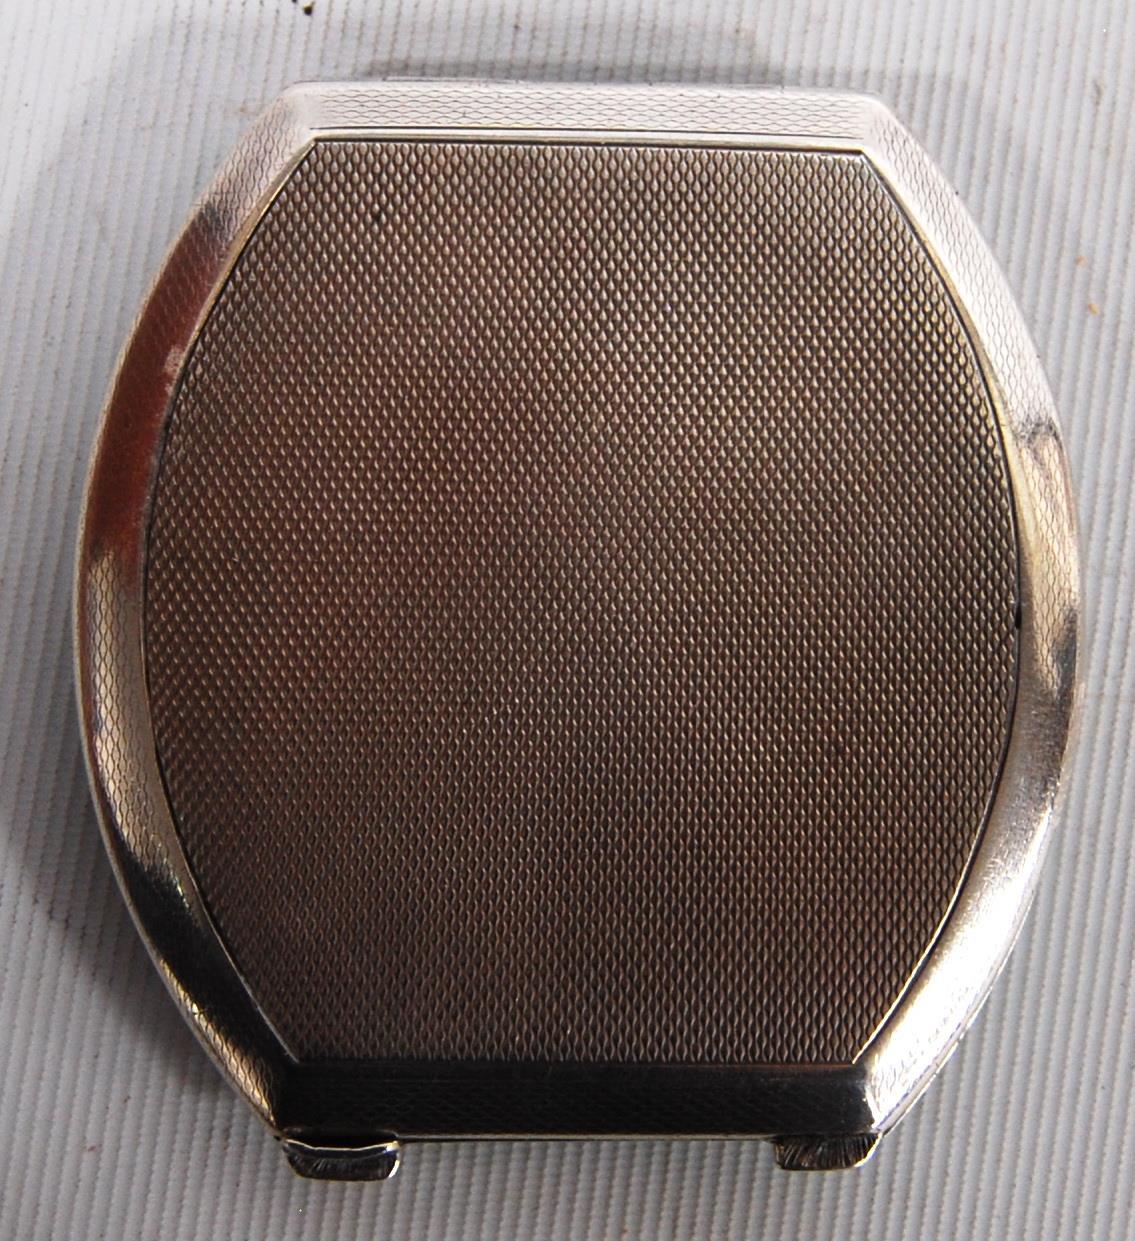 Art Deco silver and enamel hinged compact, Adie Brothers, Birmingham 1933, the black enamelled lid - Image 5 of 5